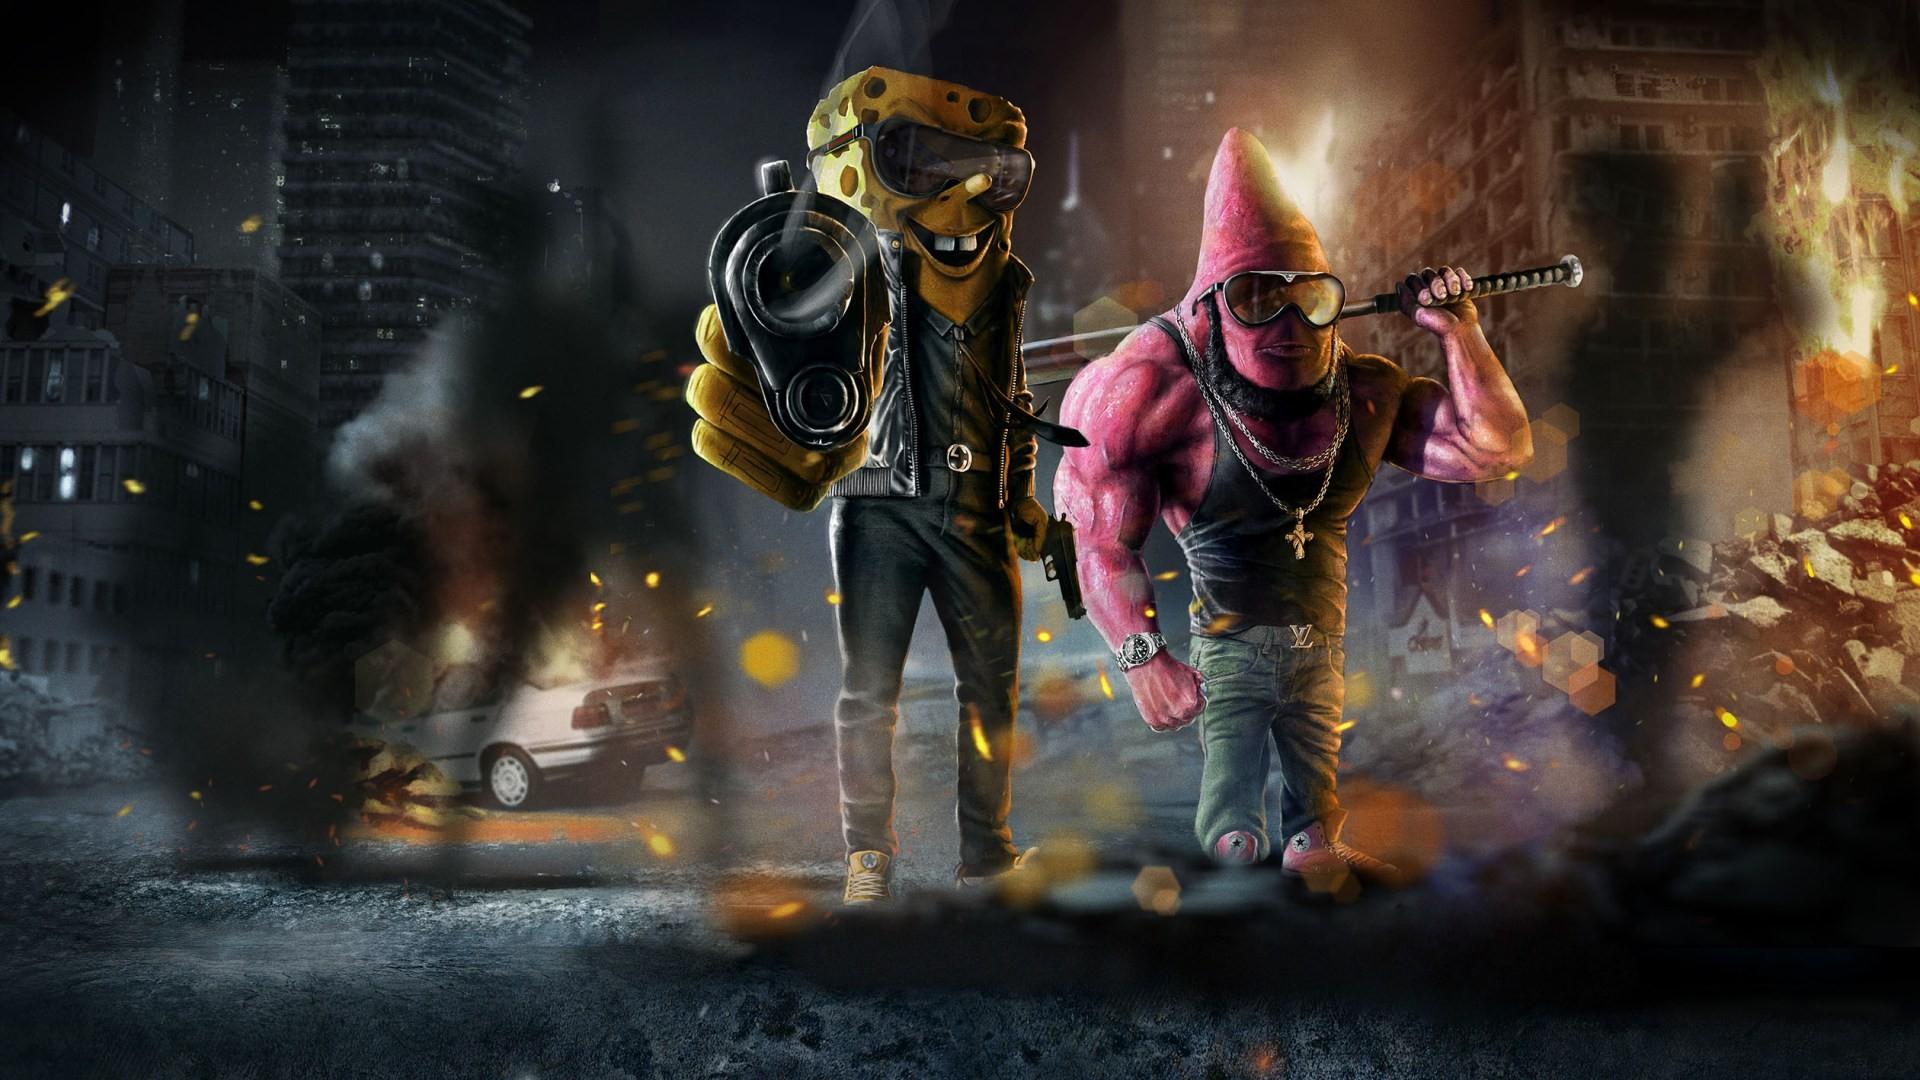 Wallpaper : gun, parody, SpongeBob SquarePants, Mafia ...